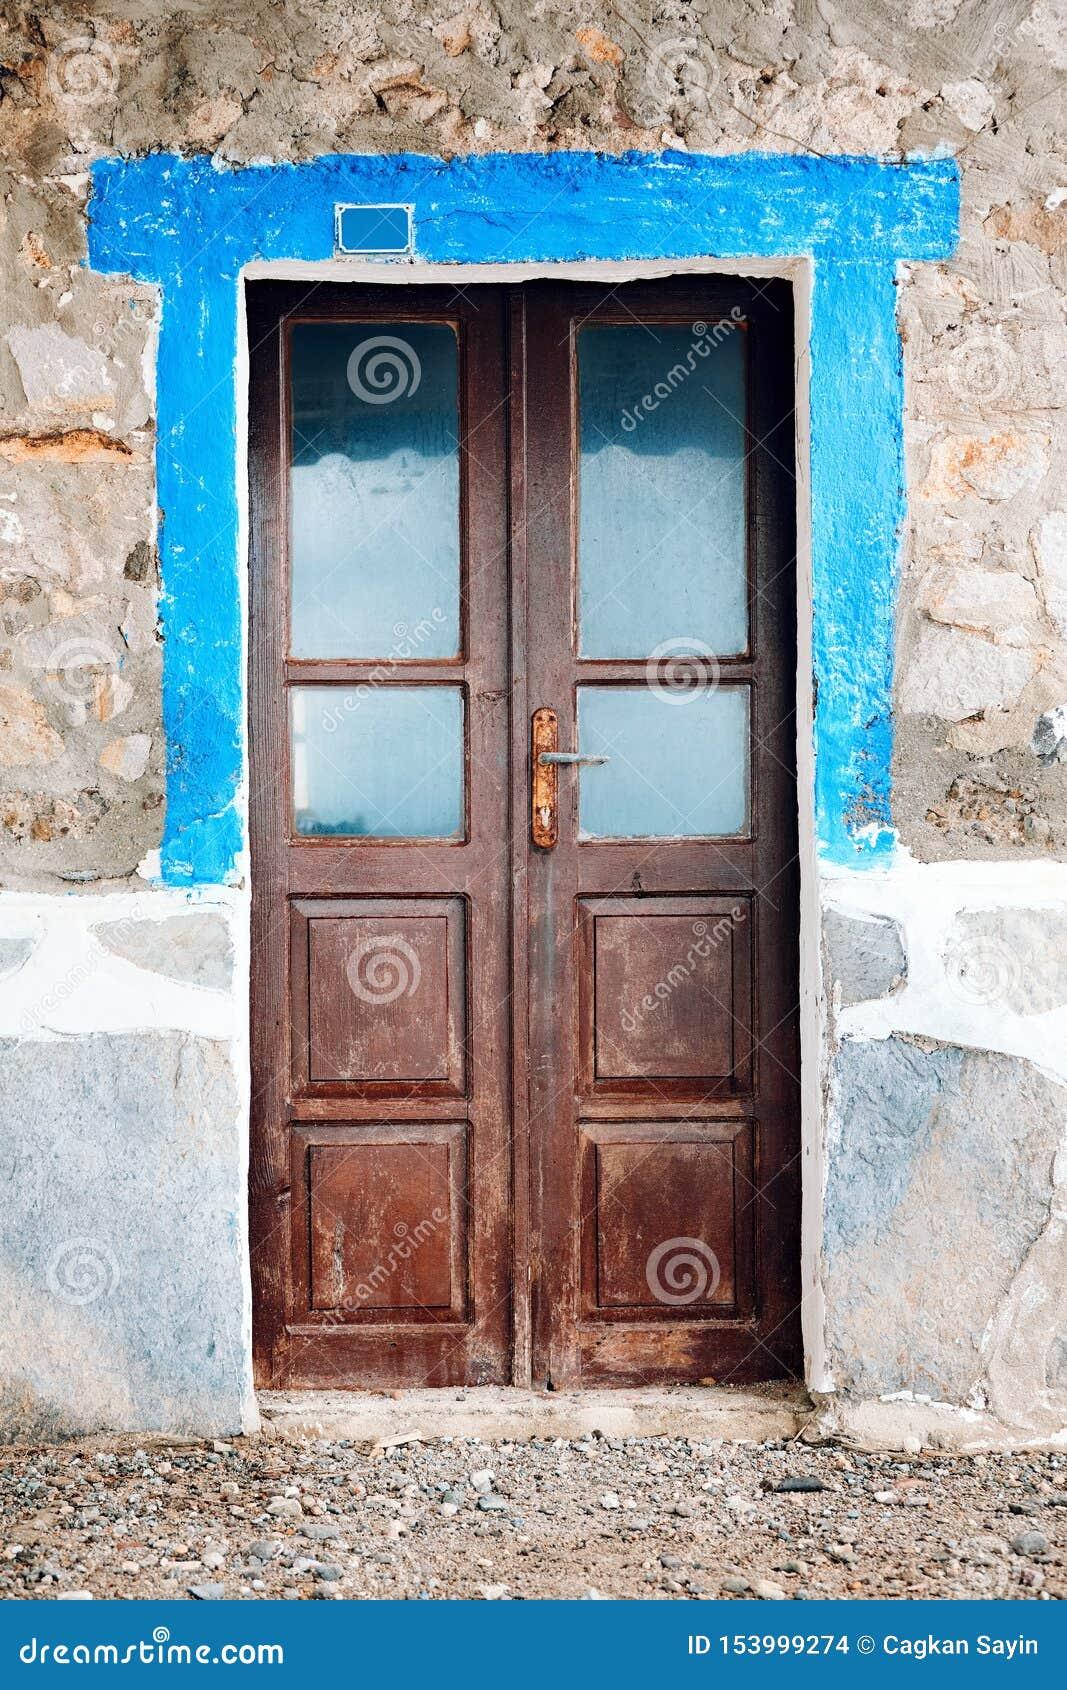 Old worn brown wooden windowed door of a vintage stone house